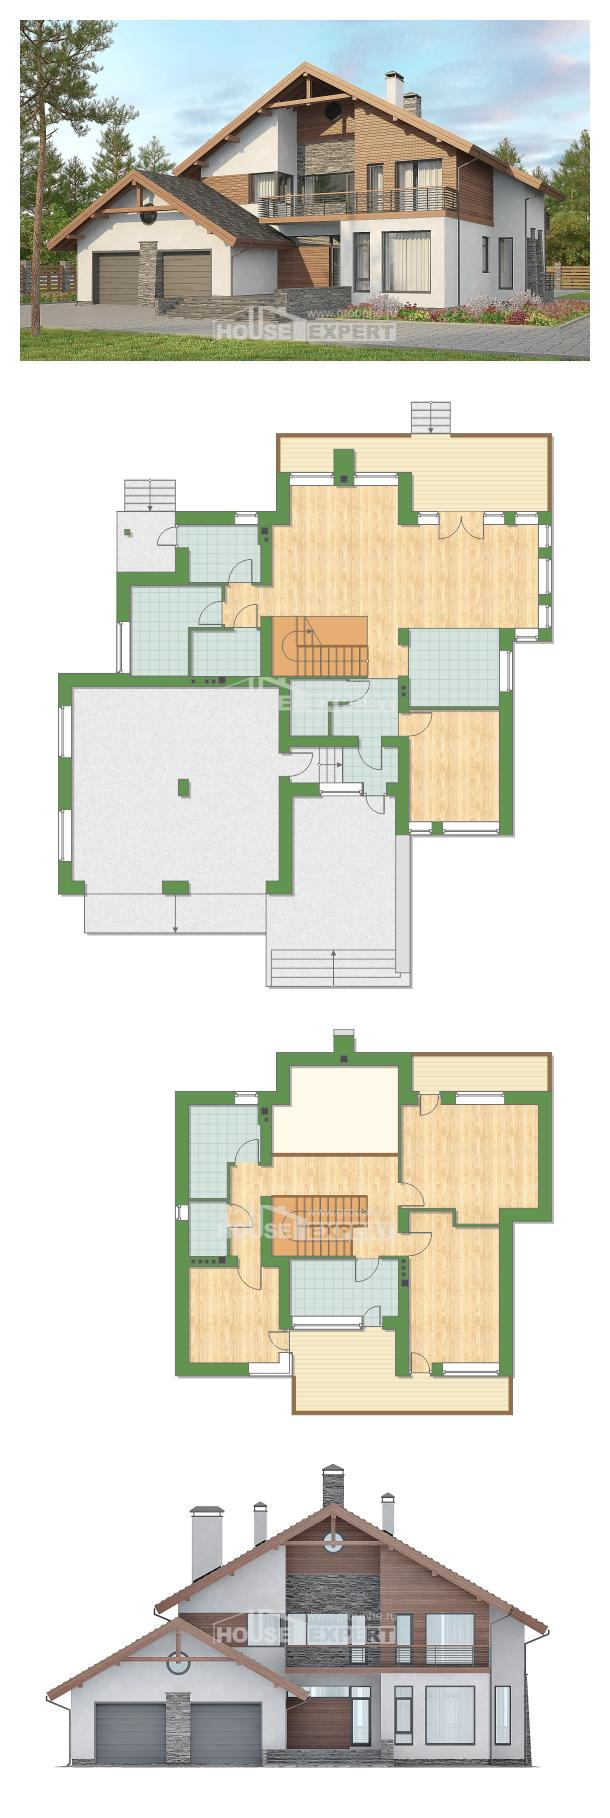 Ev villa projesi 270-003-L | House Expert